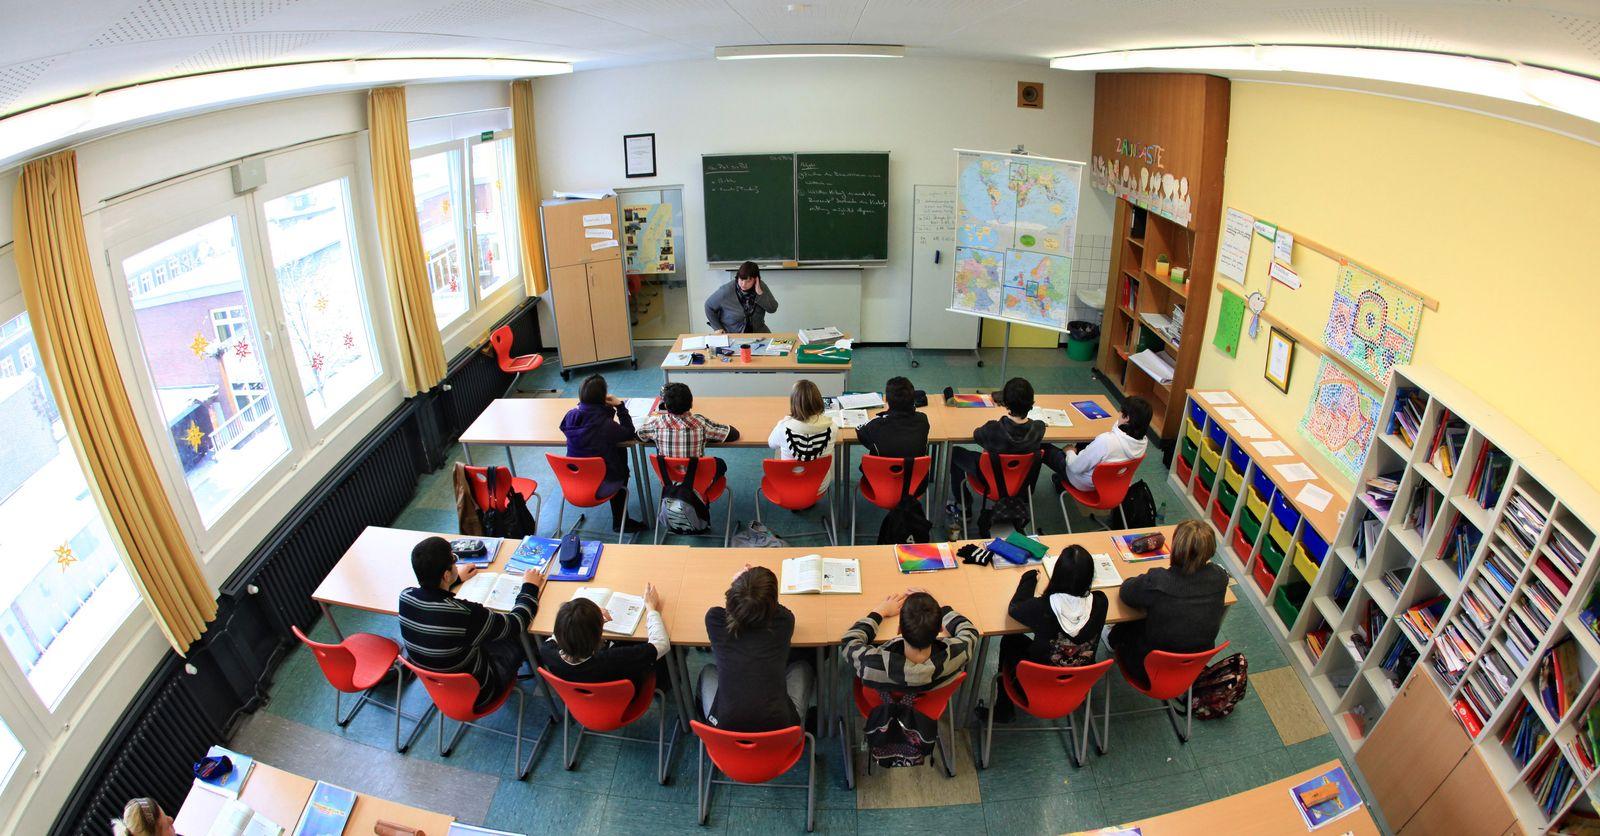 SYMBOLBILD Schule / Hauptschulklasse